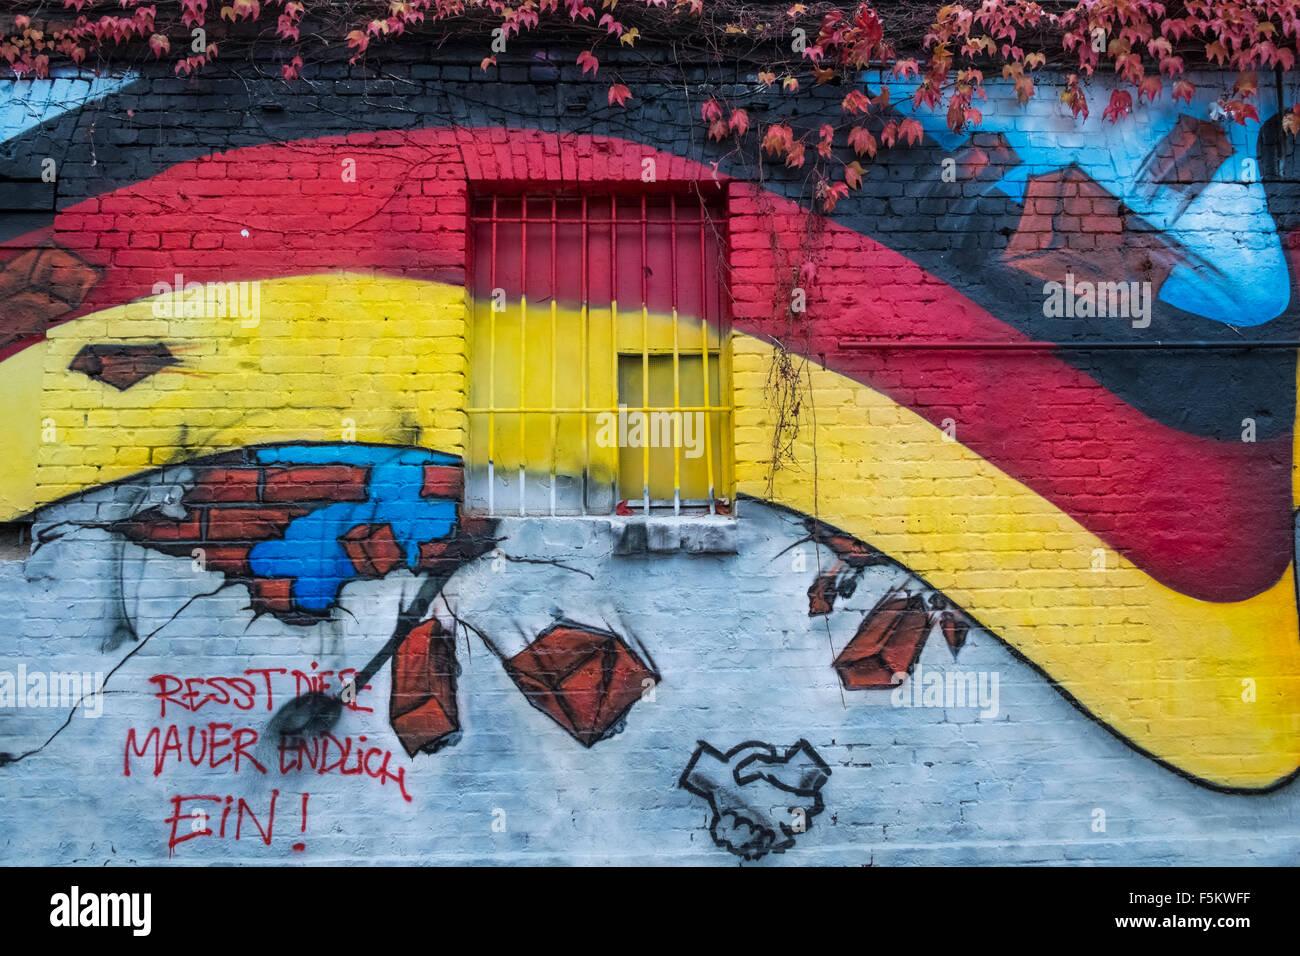 East Side Gallery artwork on the former Berlin Wall, Friedrichshain ...